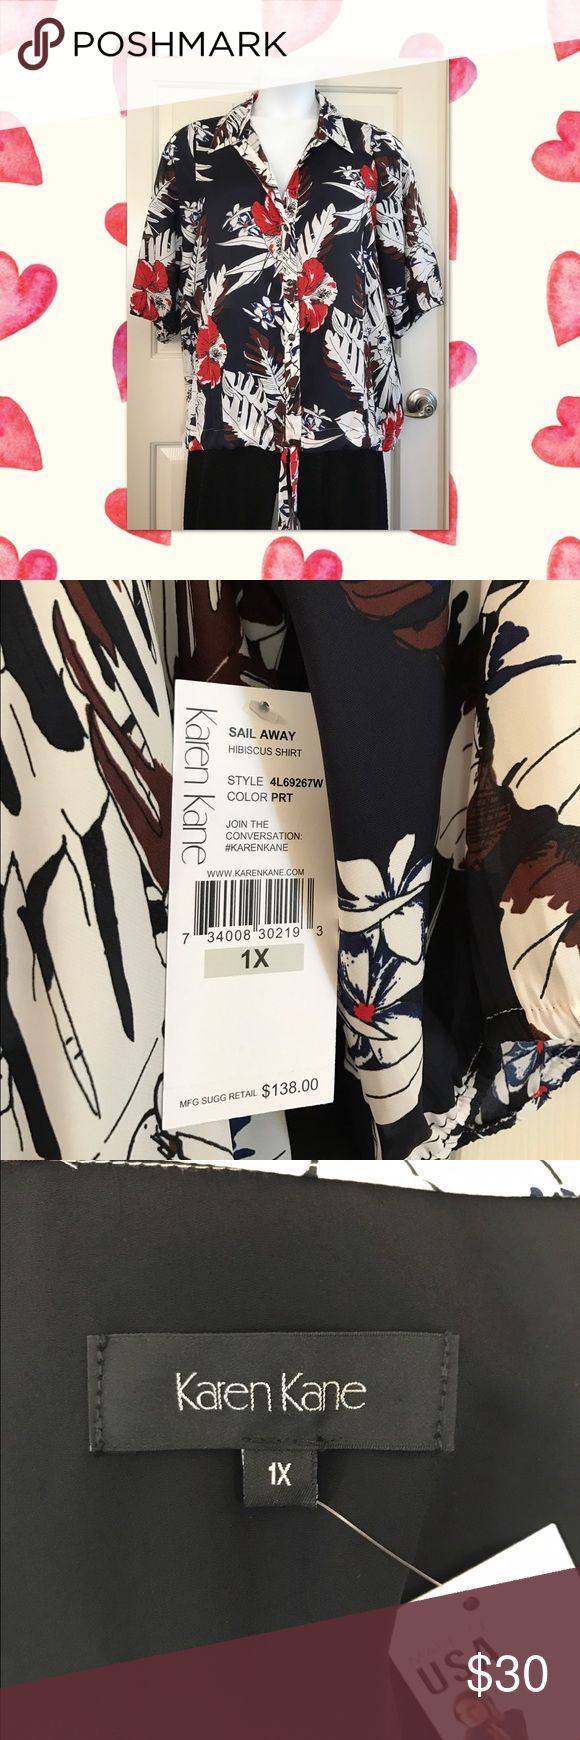 Semi-sheer Karen Kane Blouse 1X Tropical Print with tie at the bottom. Karen Kane Tops Blouses